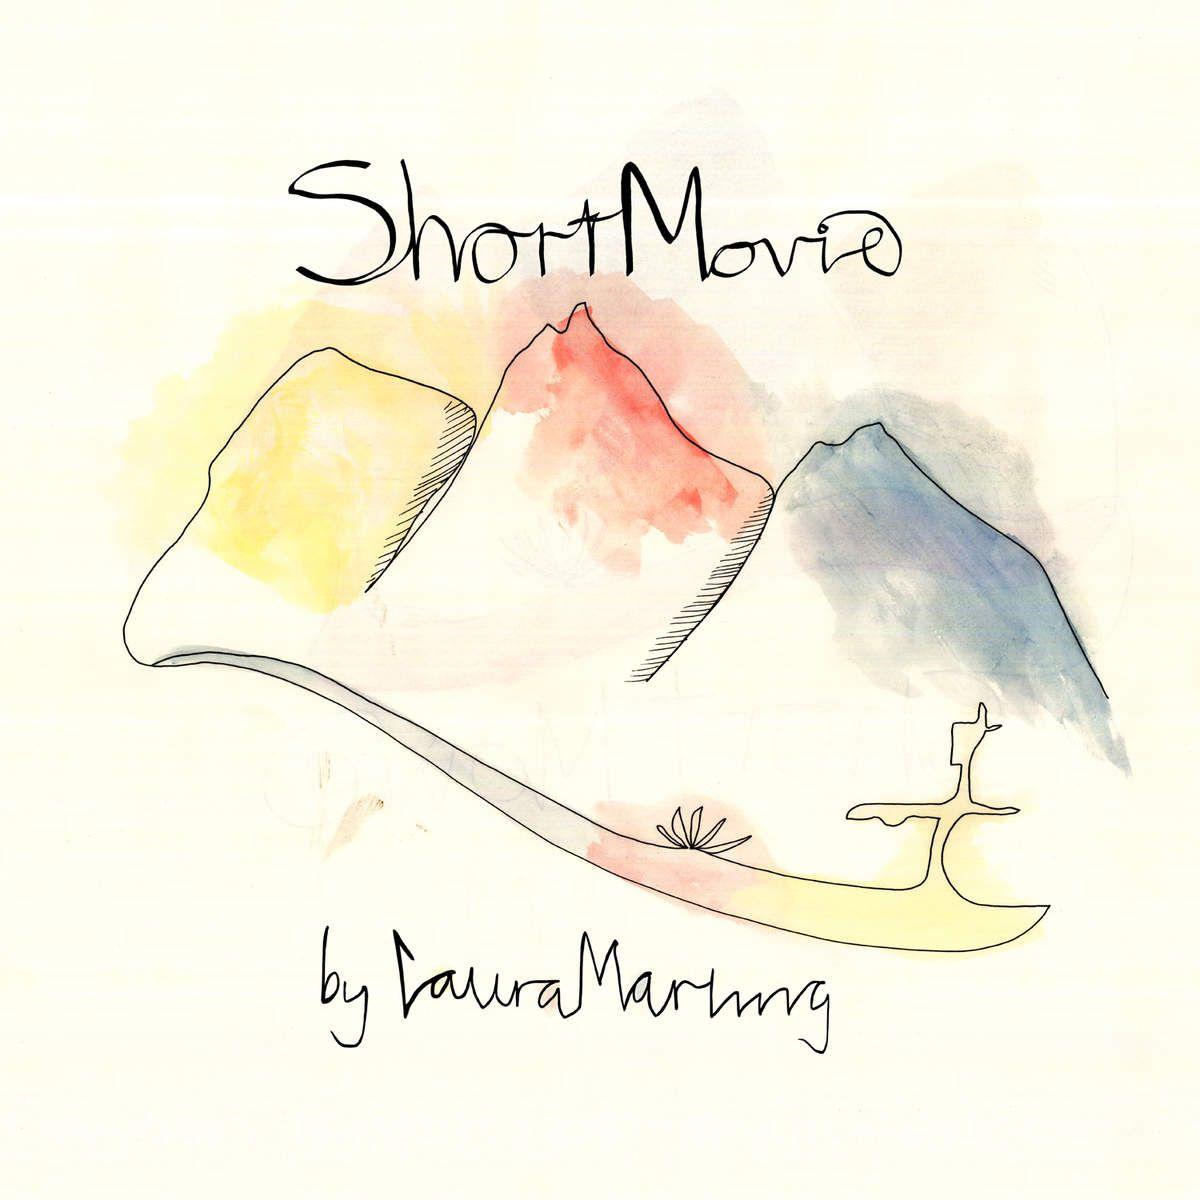 Laura Marling - Short Movie album cover